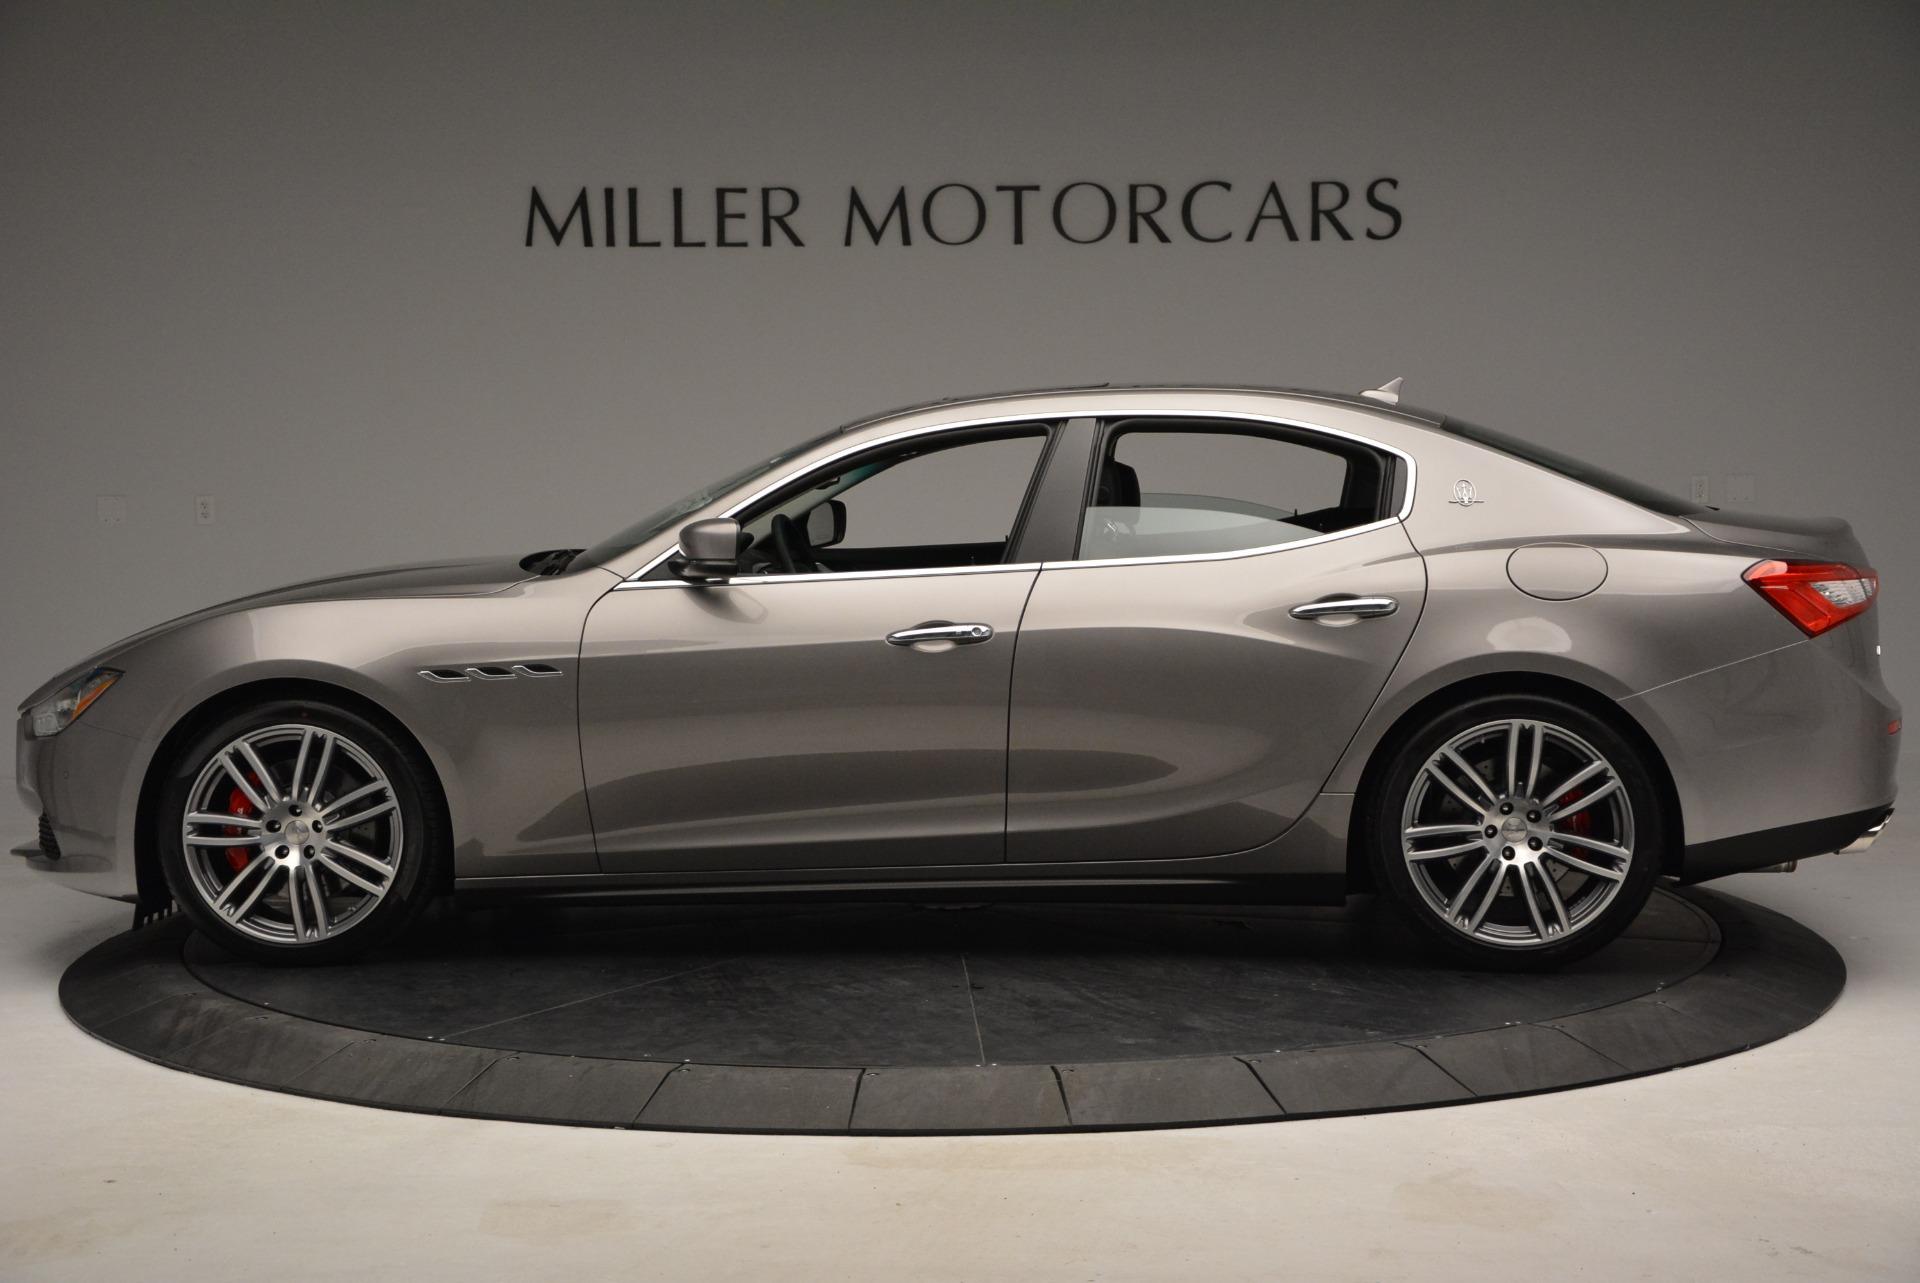 Used 2014 Maserati Ghibli S Q4 For Sale In Greenwich, CT. Alfa Romeo of Greenwich, 7426 2562_p3